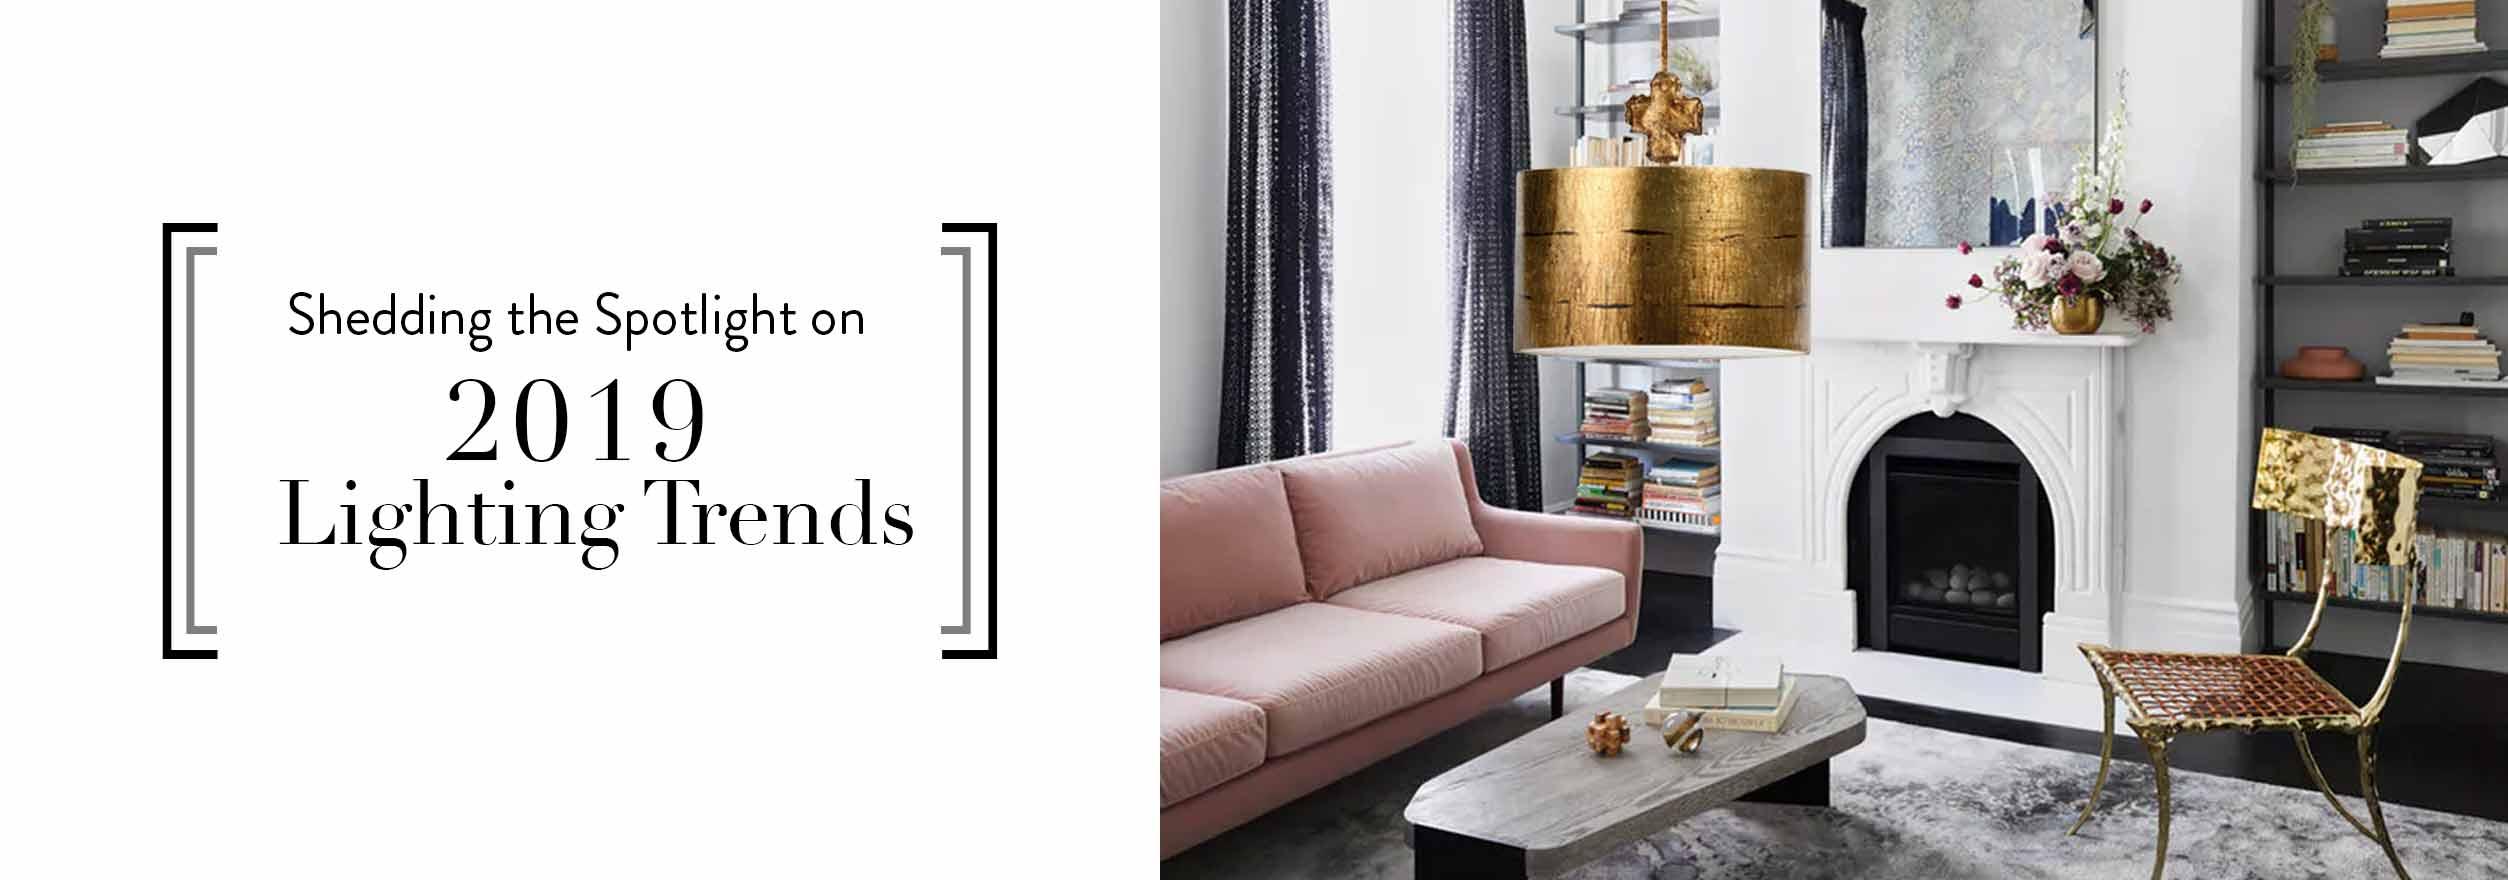 Shedding the Spotlight on 2019 Lighting Trends | Blog |